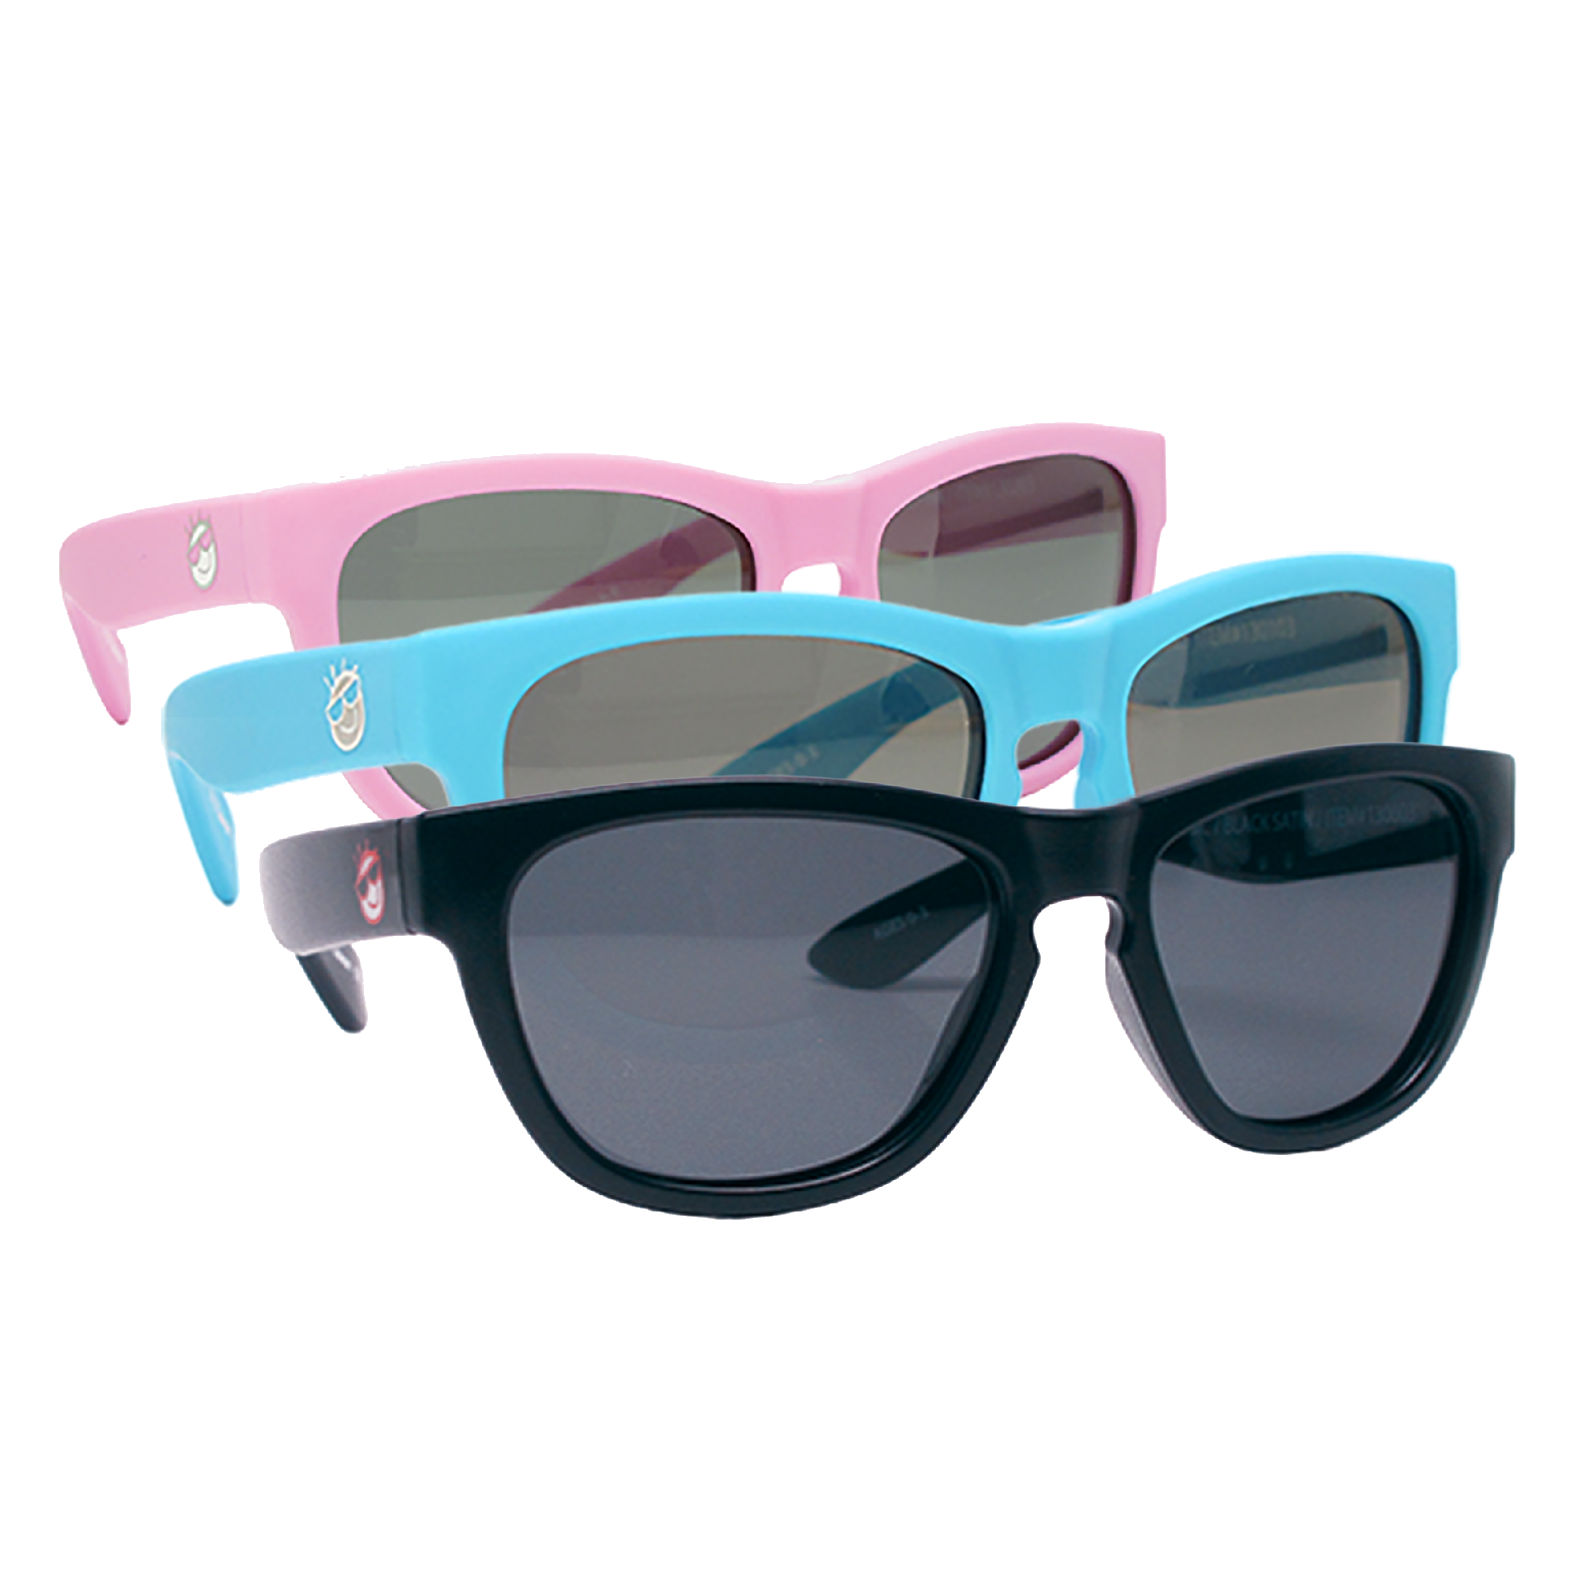 K's Reflekt Polarized Classic Mini Shades, 0-3